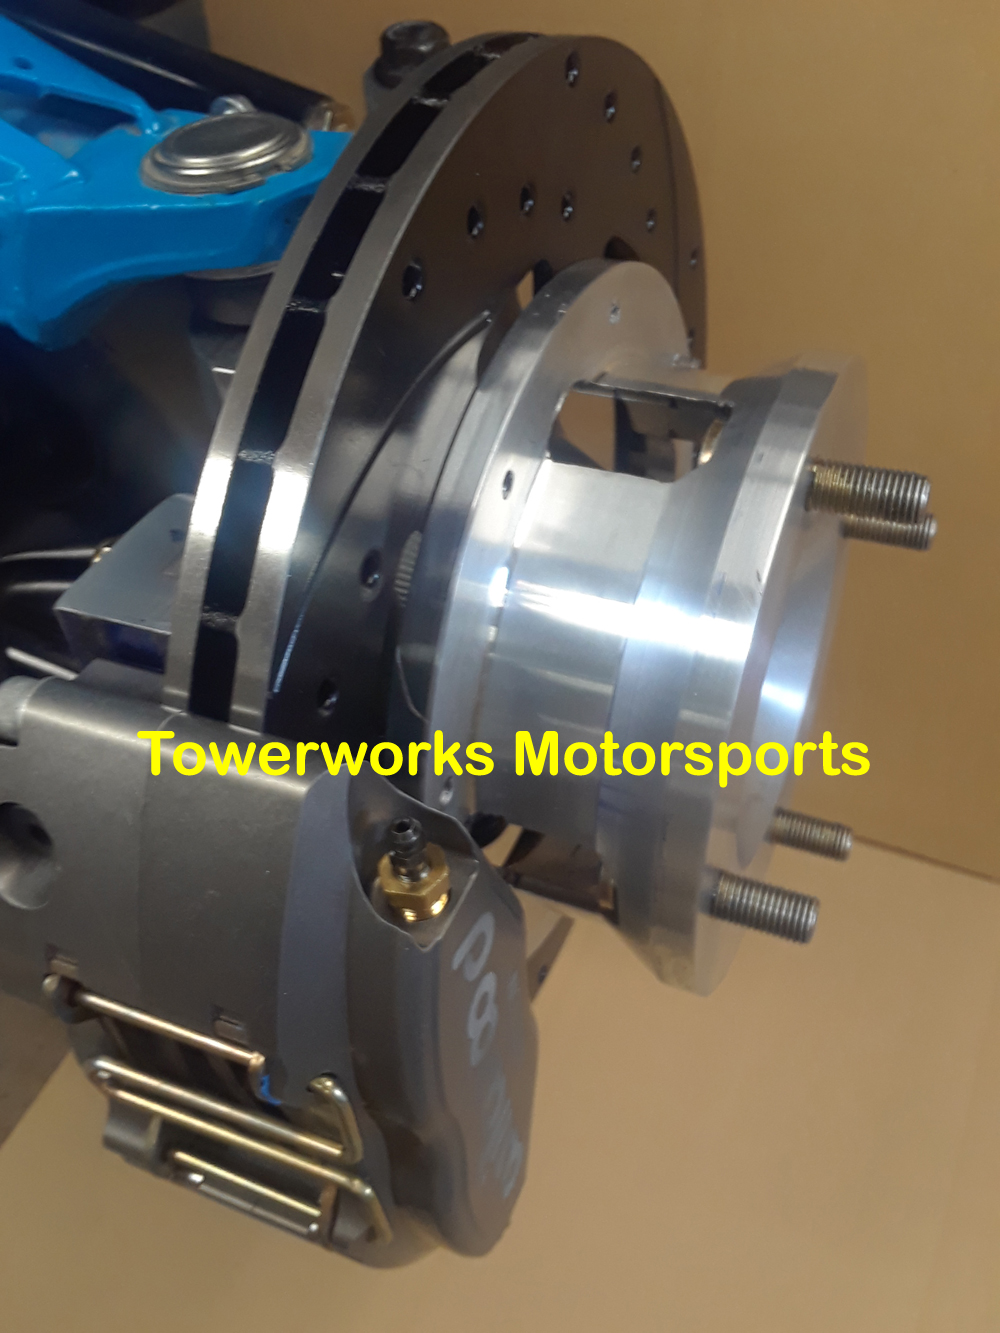 Can Am Big Brake Towerworks Motorsports